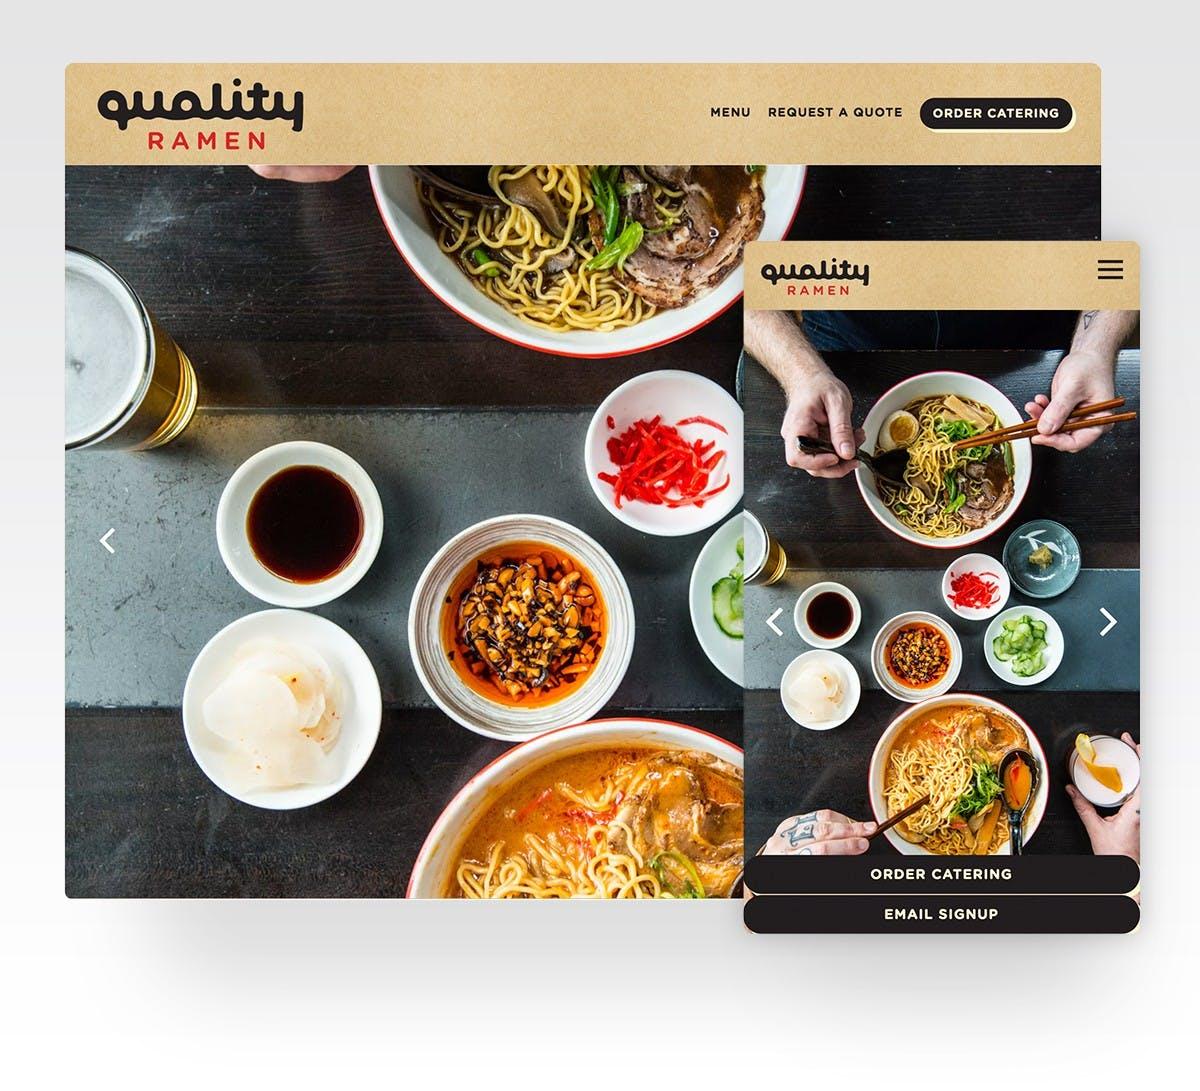 Quality Ramen's website